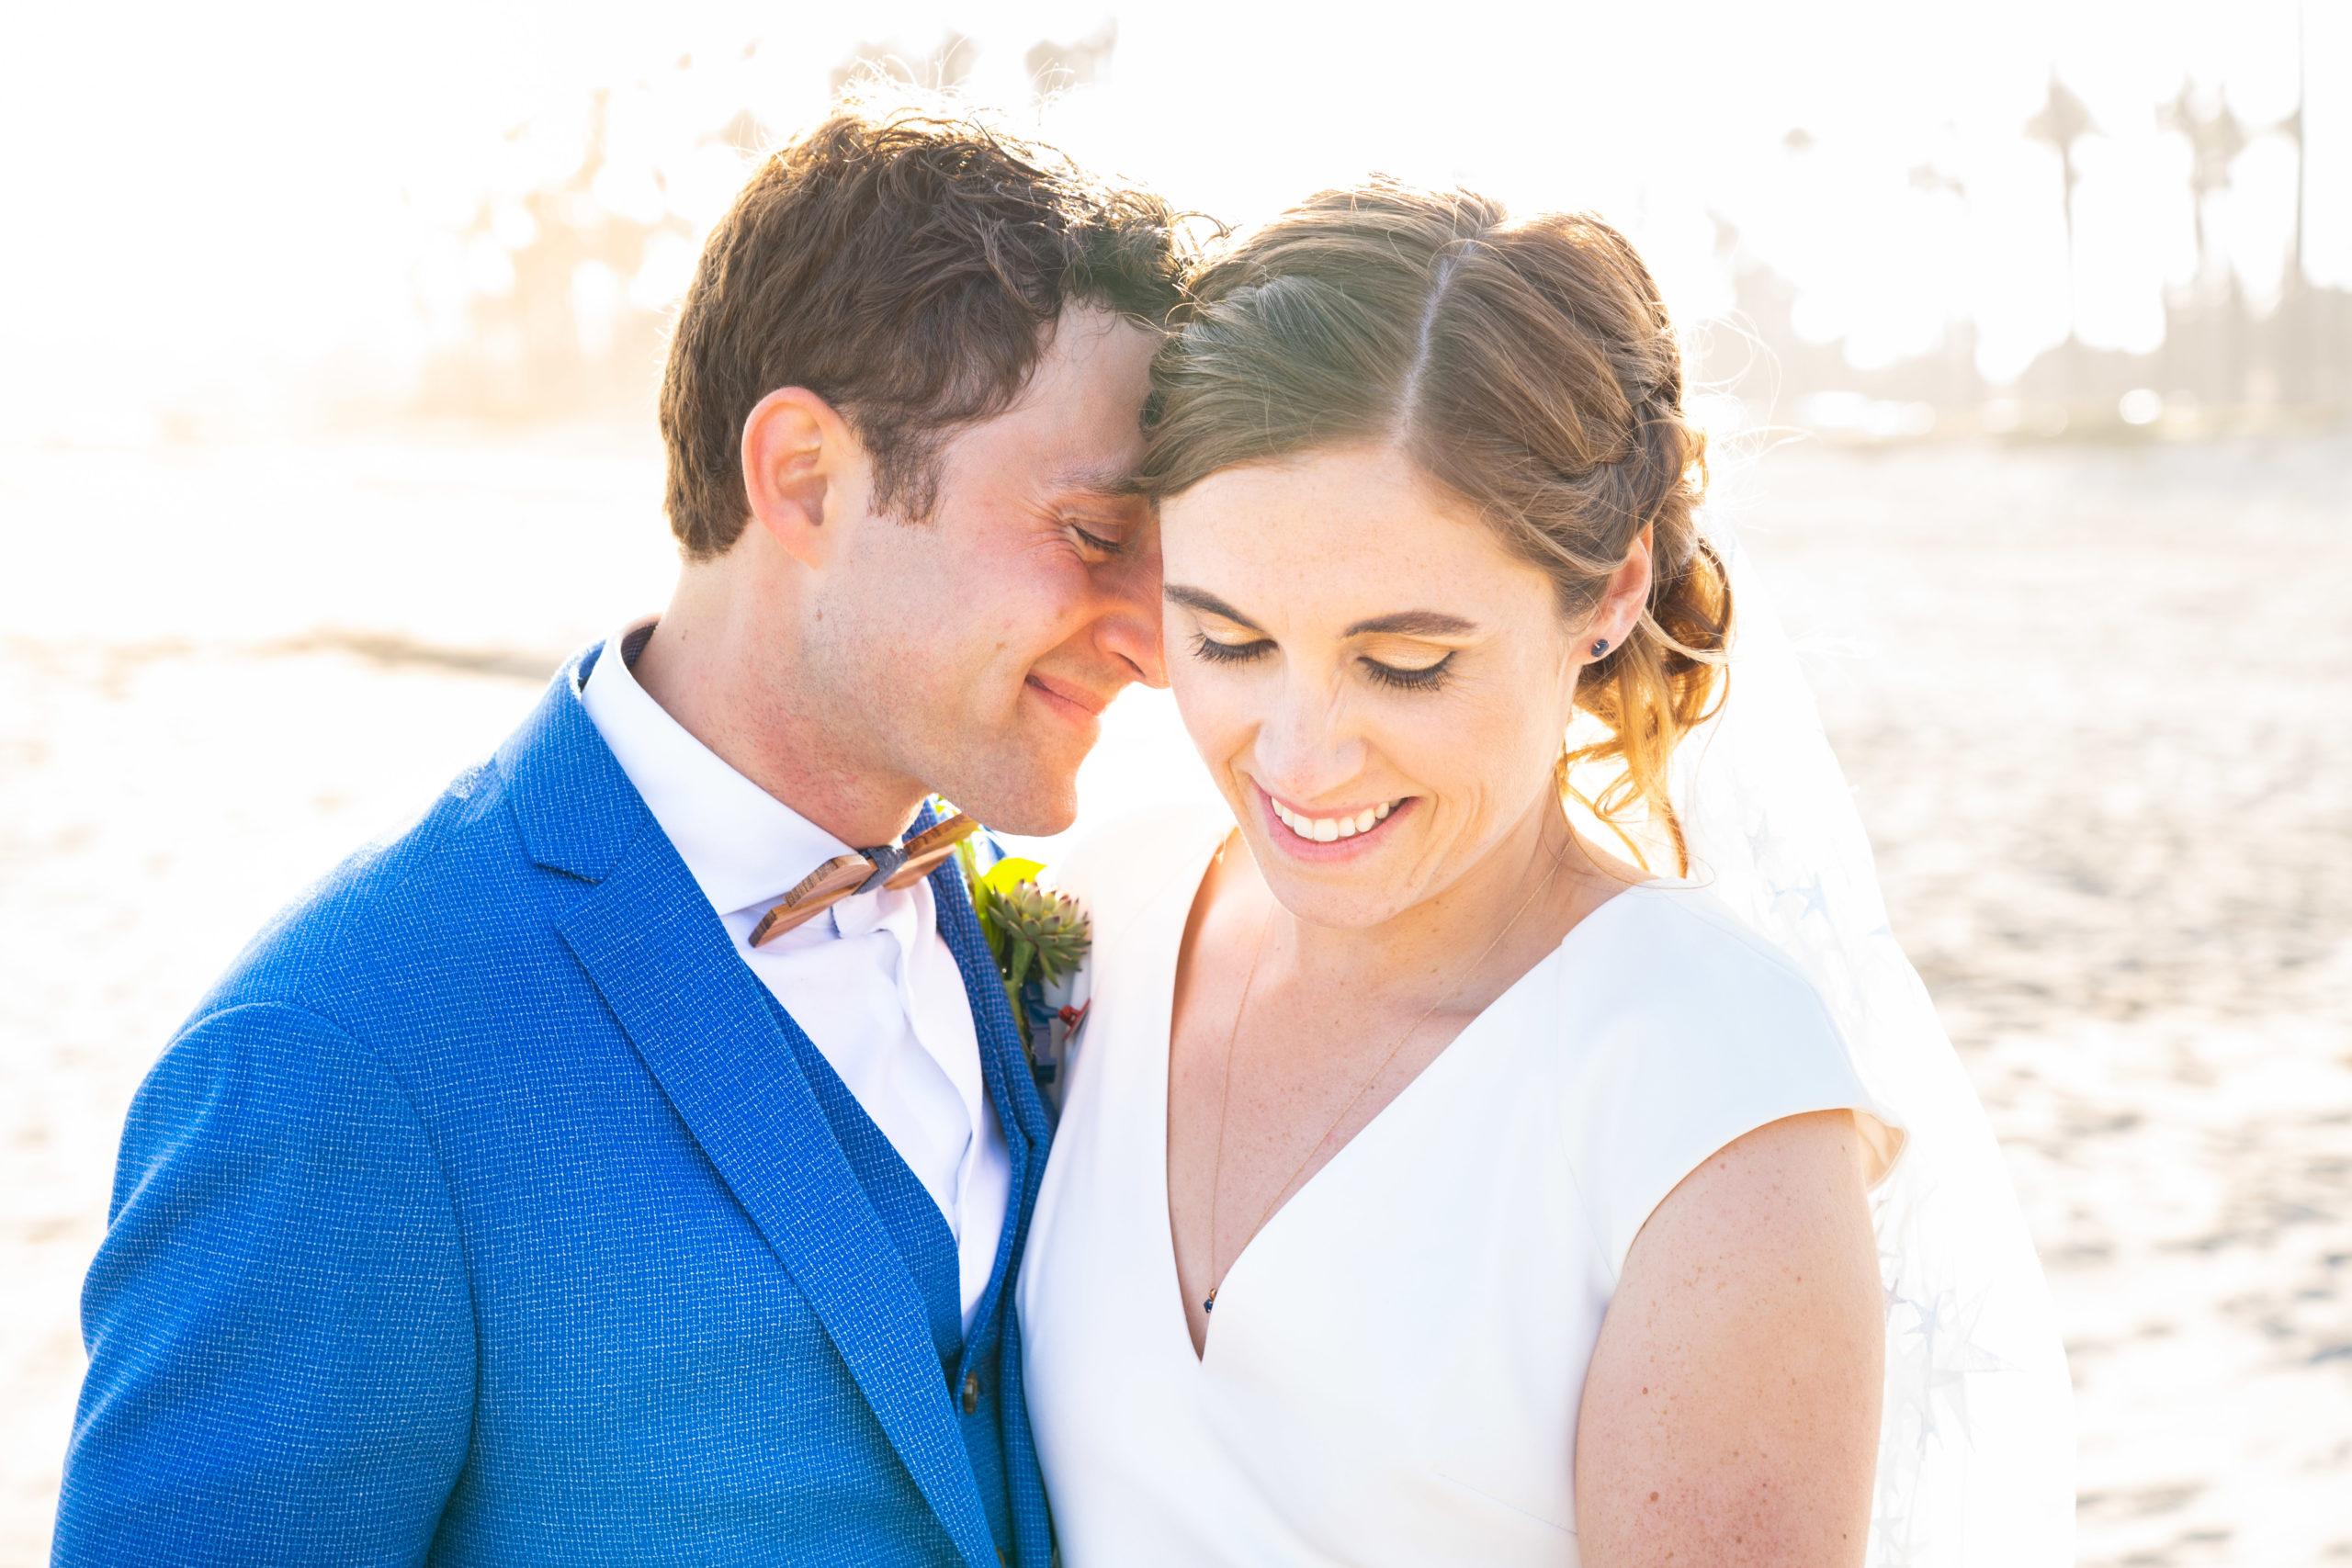 Couple married on beach